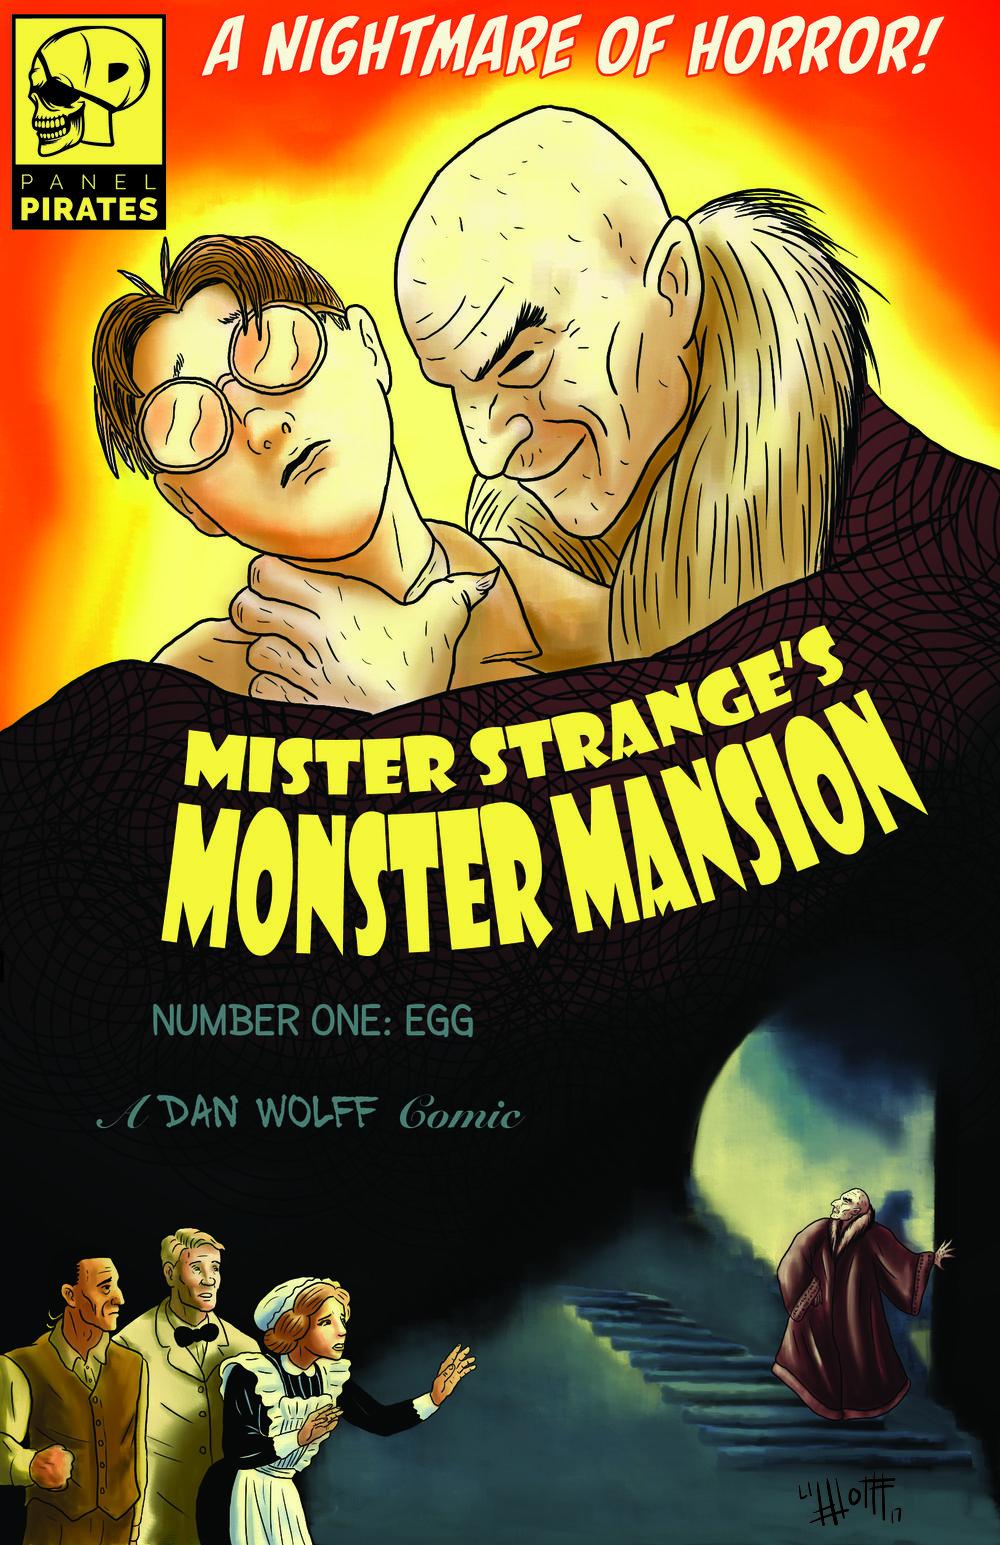 monstermanor.jpg